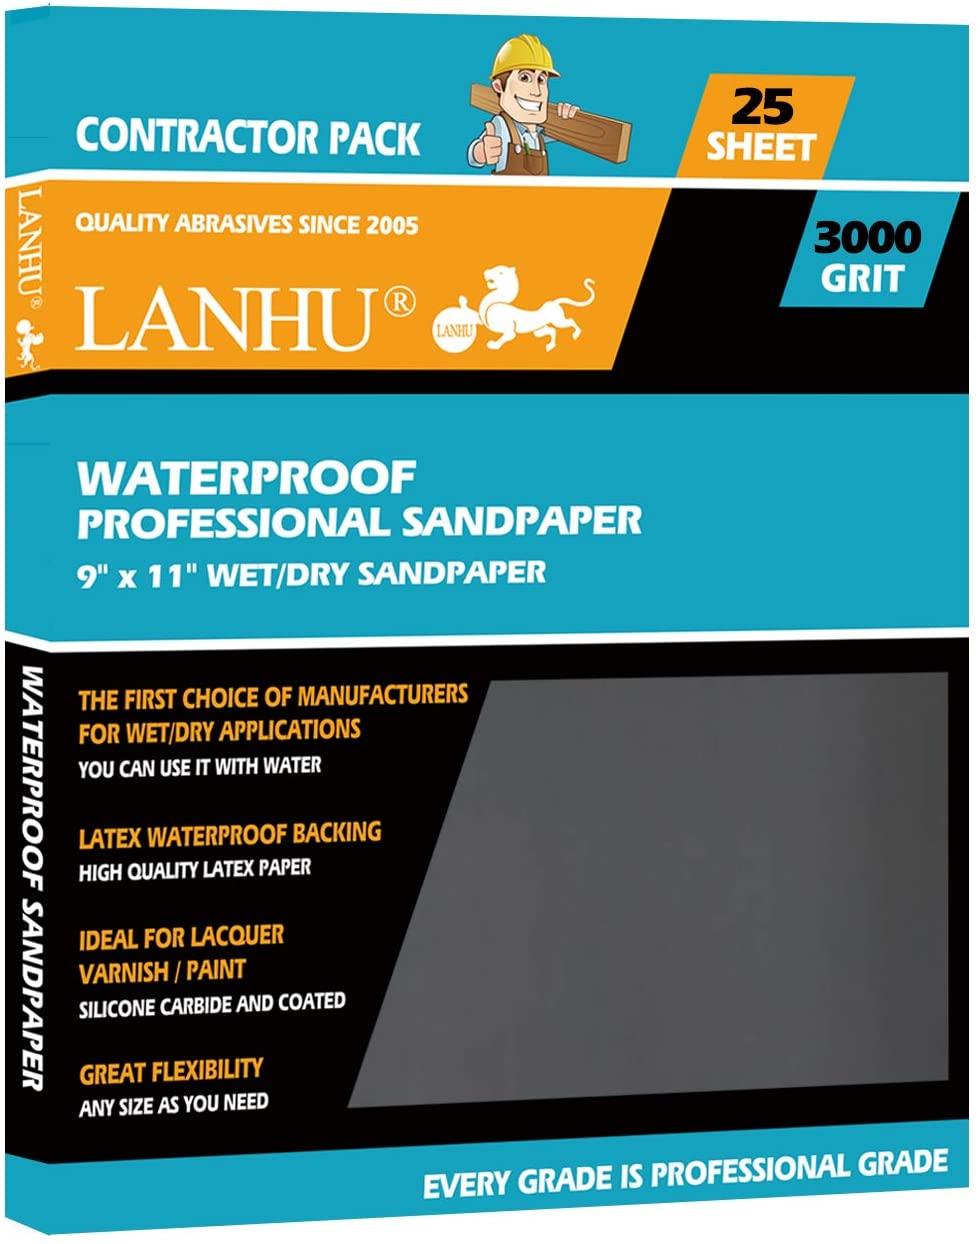 LANHU 3000 Grit Sandpaper for Wood Furniture Finishing, Metal Sanding and Automotive Polishing, Dry or Wet Sanding, Multipurpose Sandpaper, 9 x 11 Inches, 25-Sheets